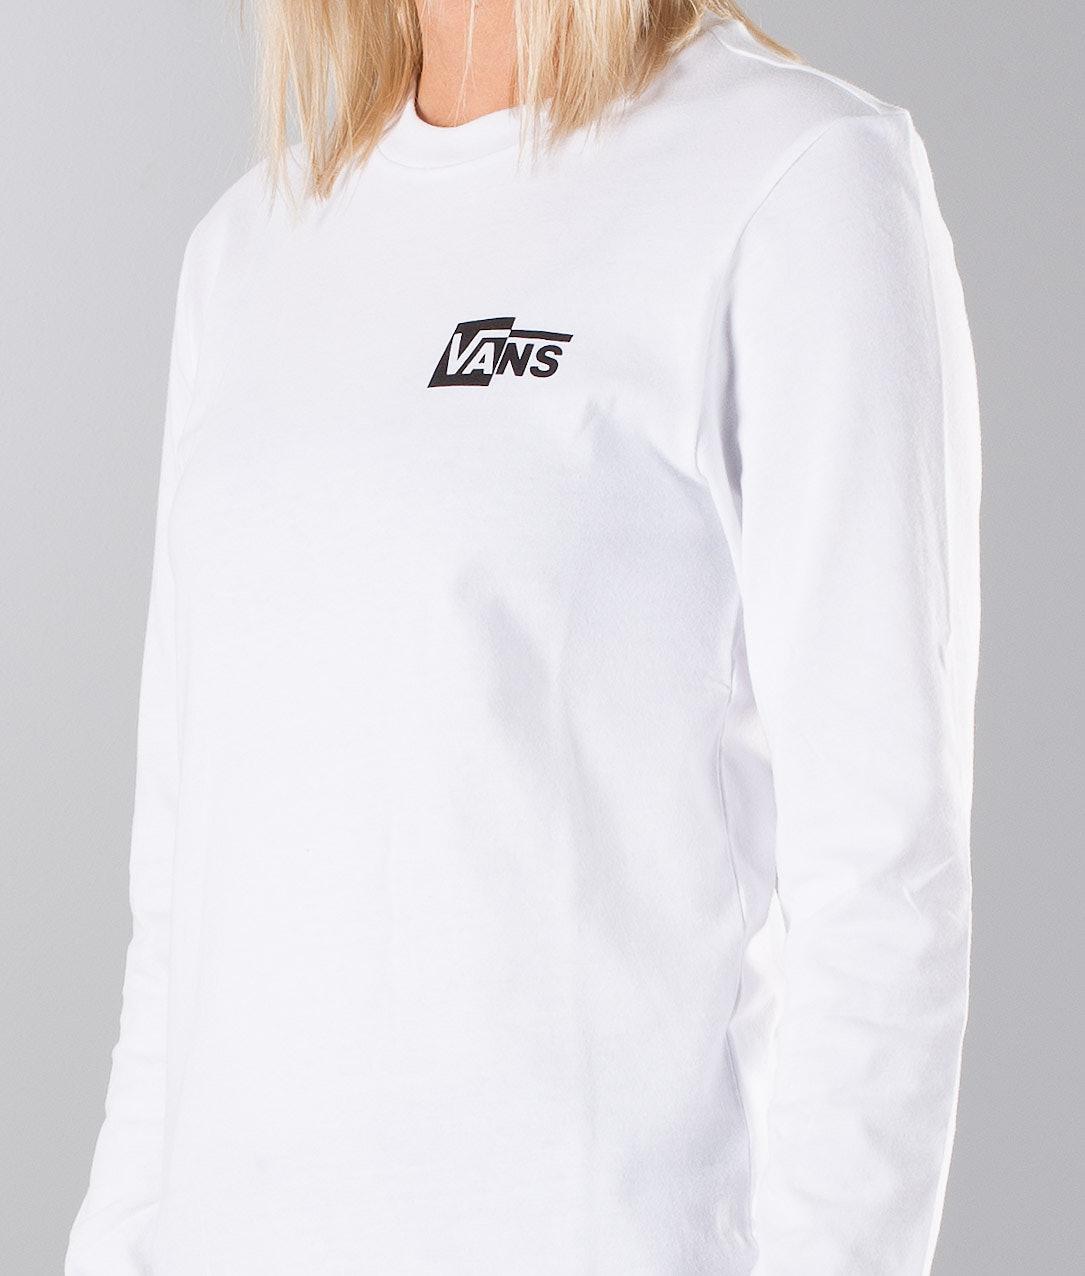 afc748010 Vans Half Checked T-shirt White - Ridestore.com